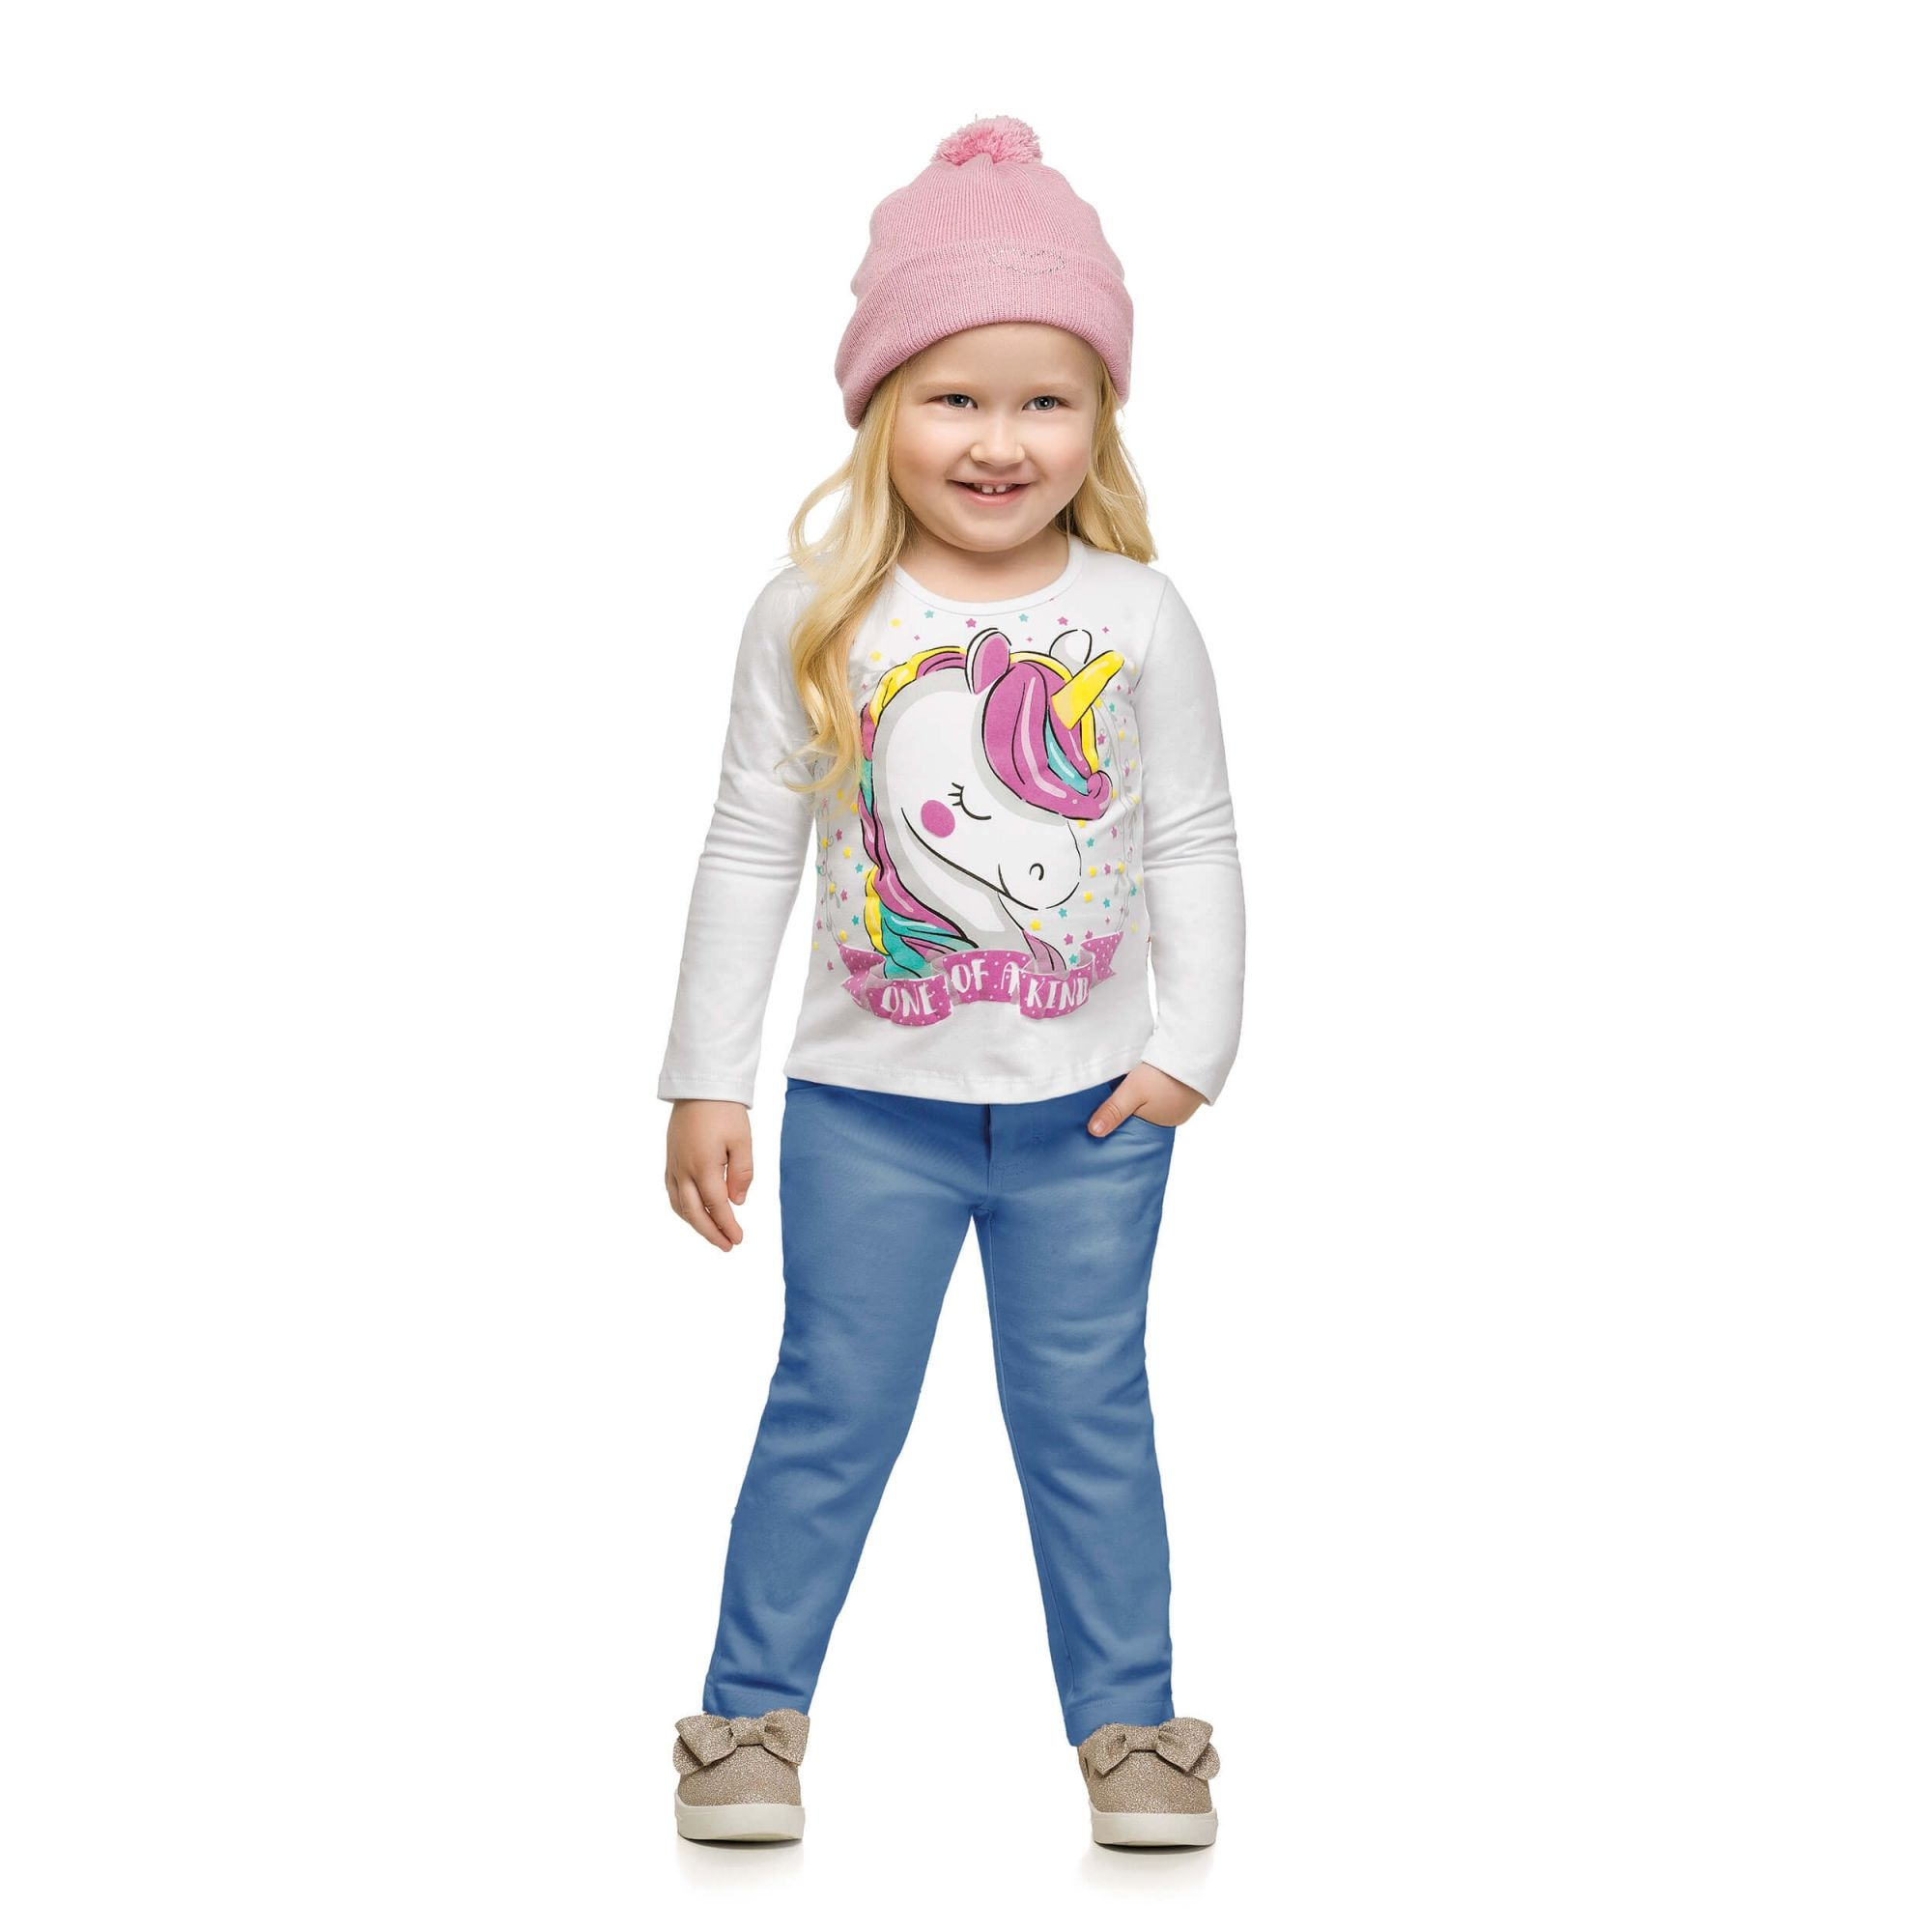 Blusa Feminina Infantil Inverno Branca Unicórnio Elian